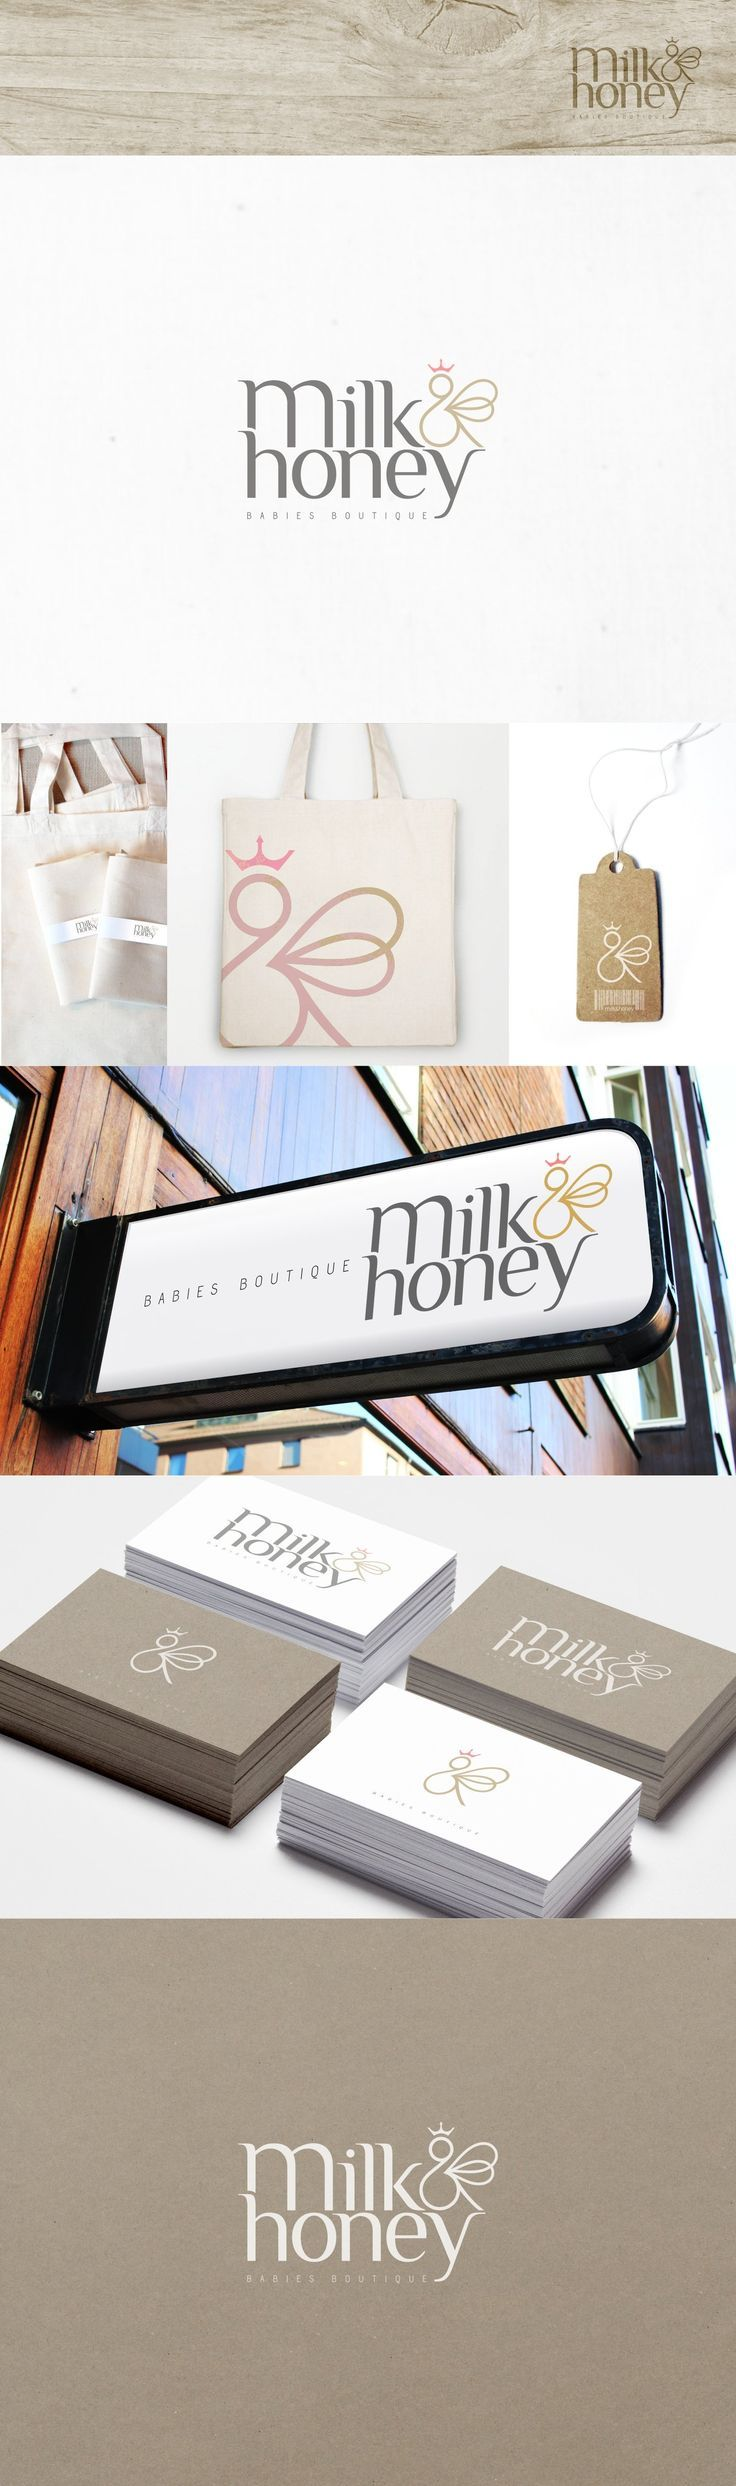 milk&honey logo and branding http://jrstudioweb.com/diseno-grafico/diseno-de-logotipos/